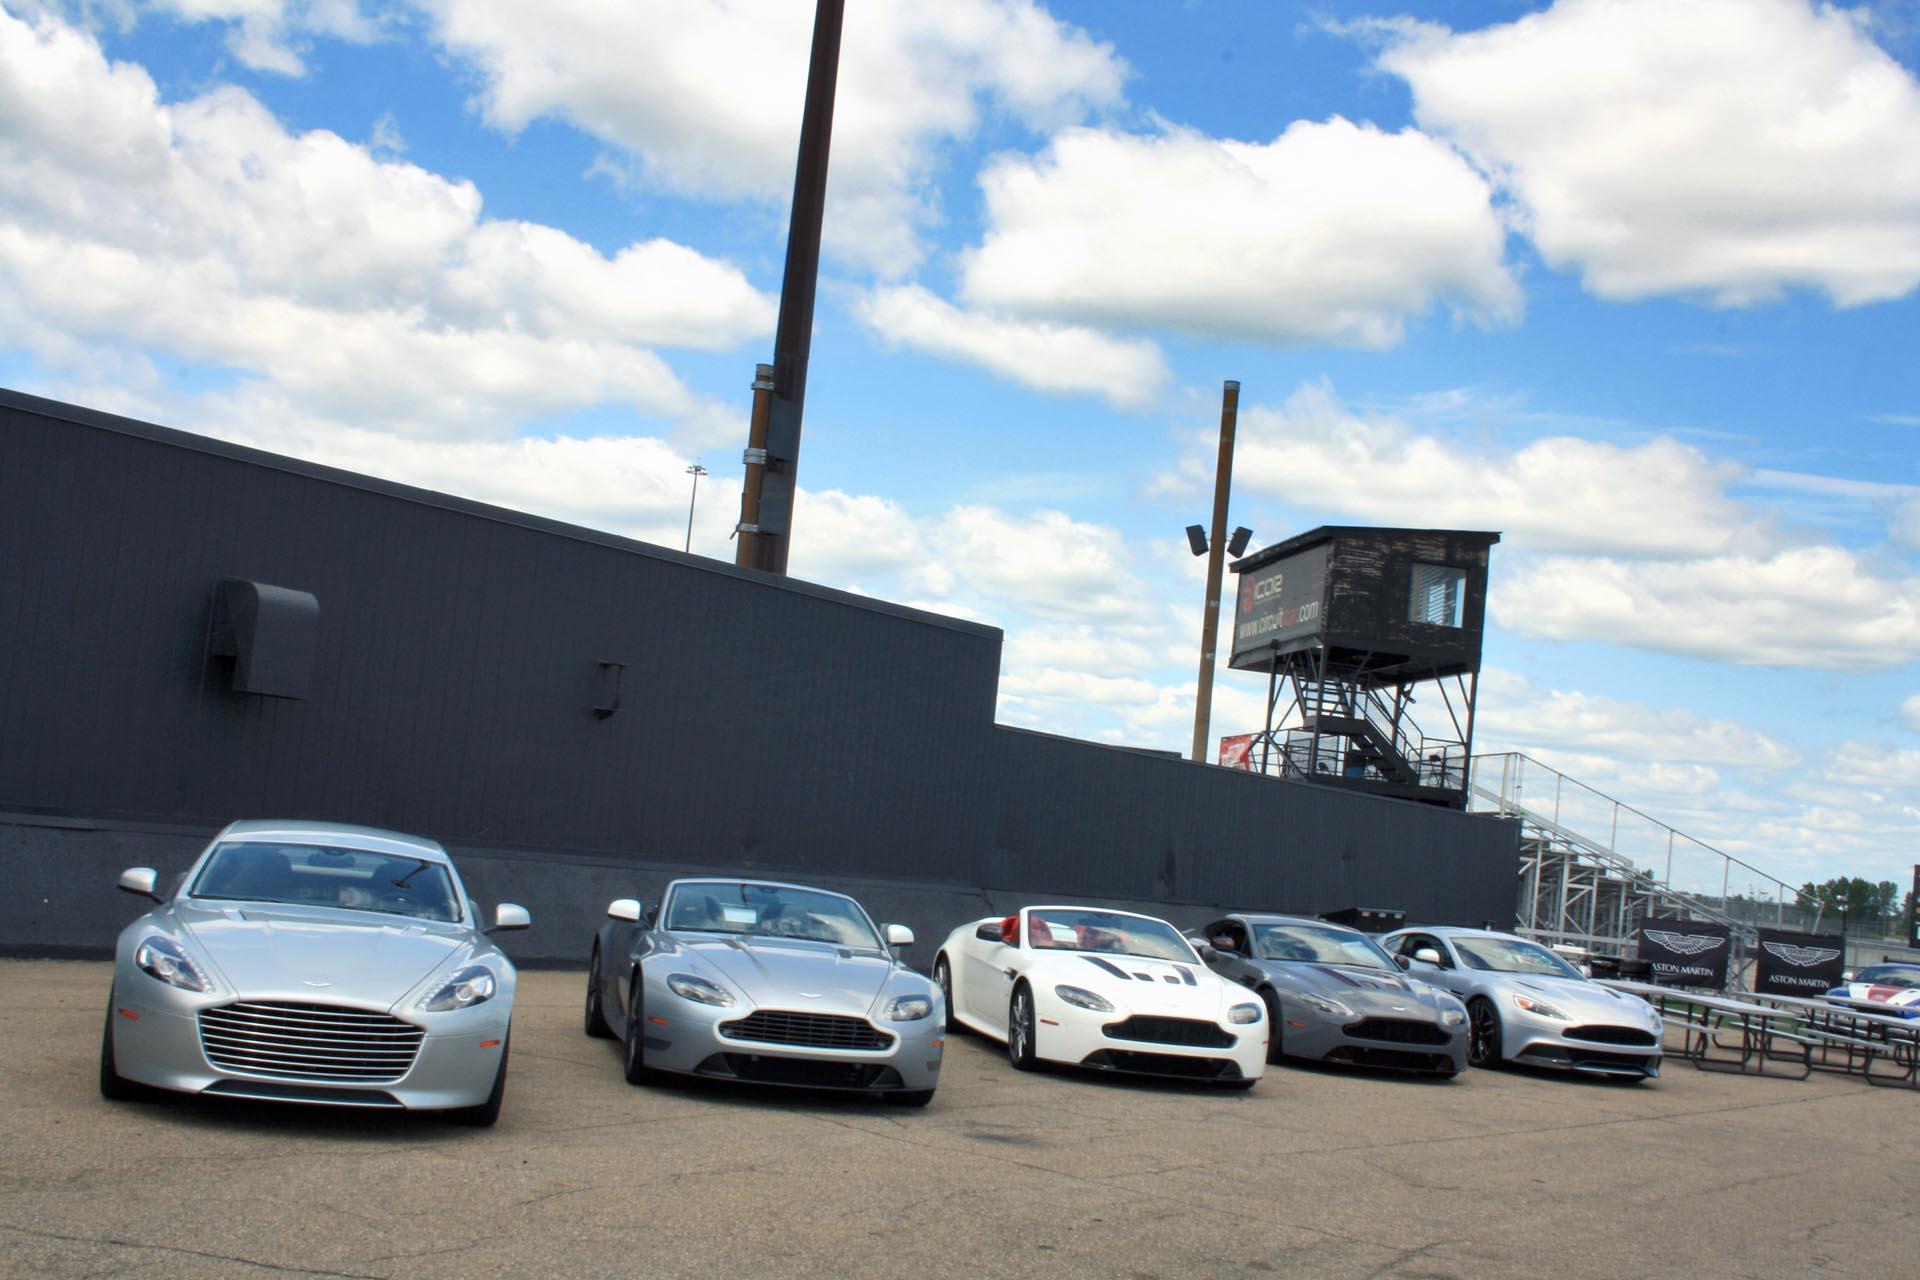 Left to right: Rapide S, Vantage GT Roadster, V12 Vantage S Roadster, V12 Vantage S, Vanquish